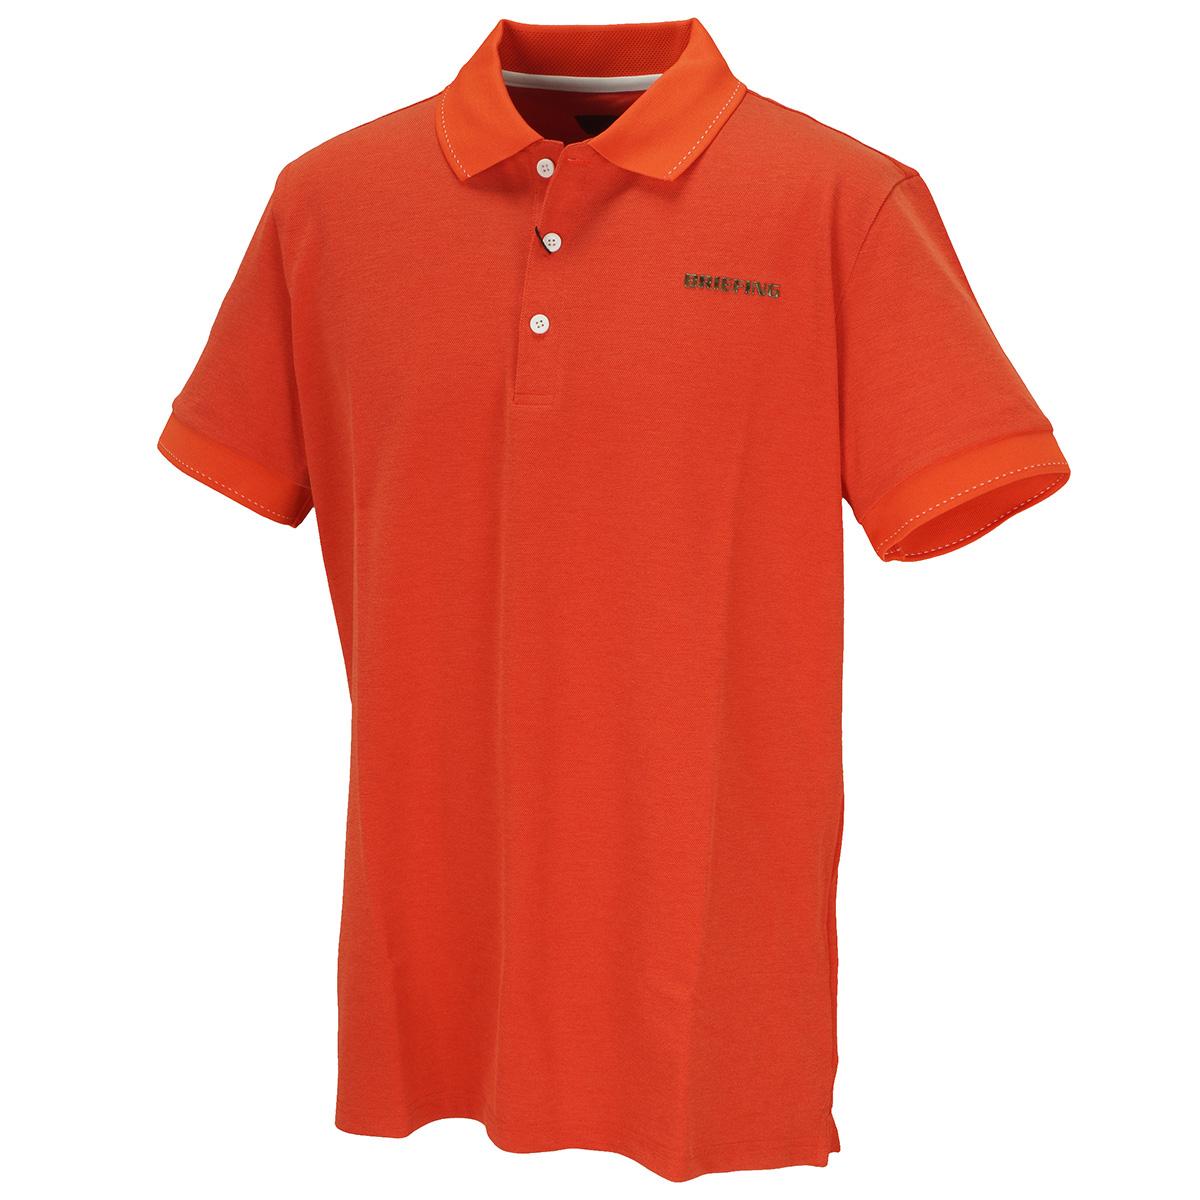 CLASSIC 半袖ポロシャツ